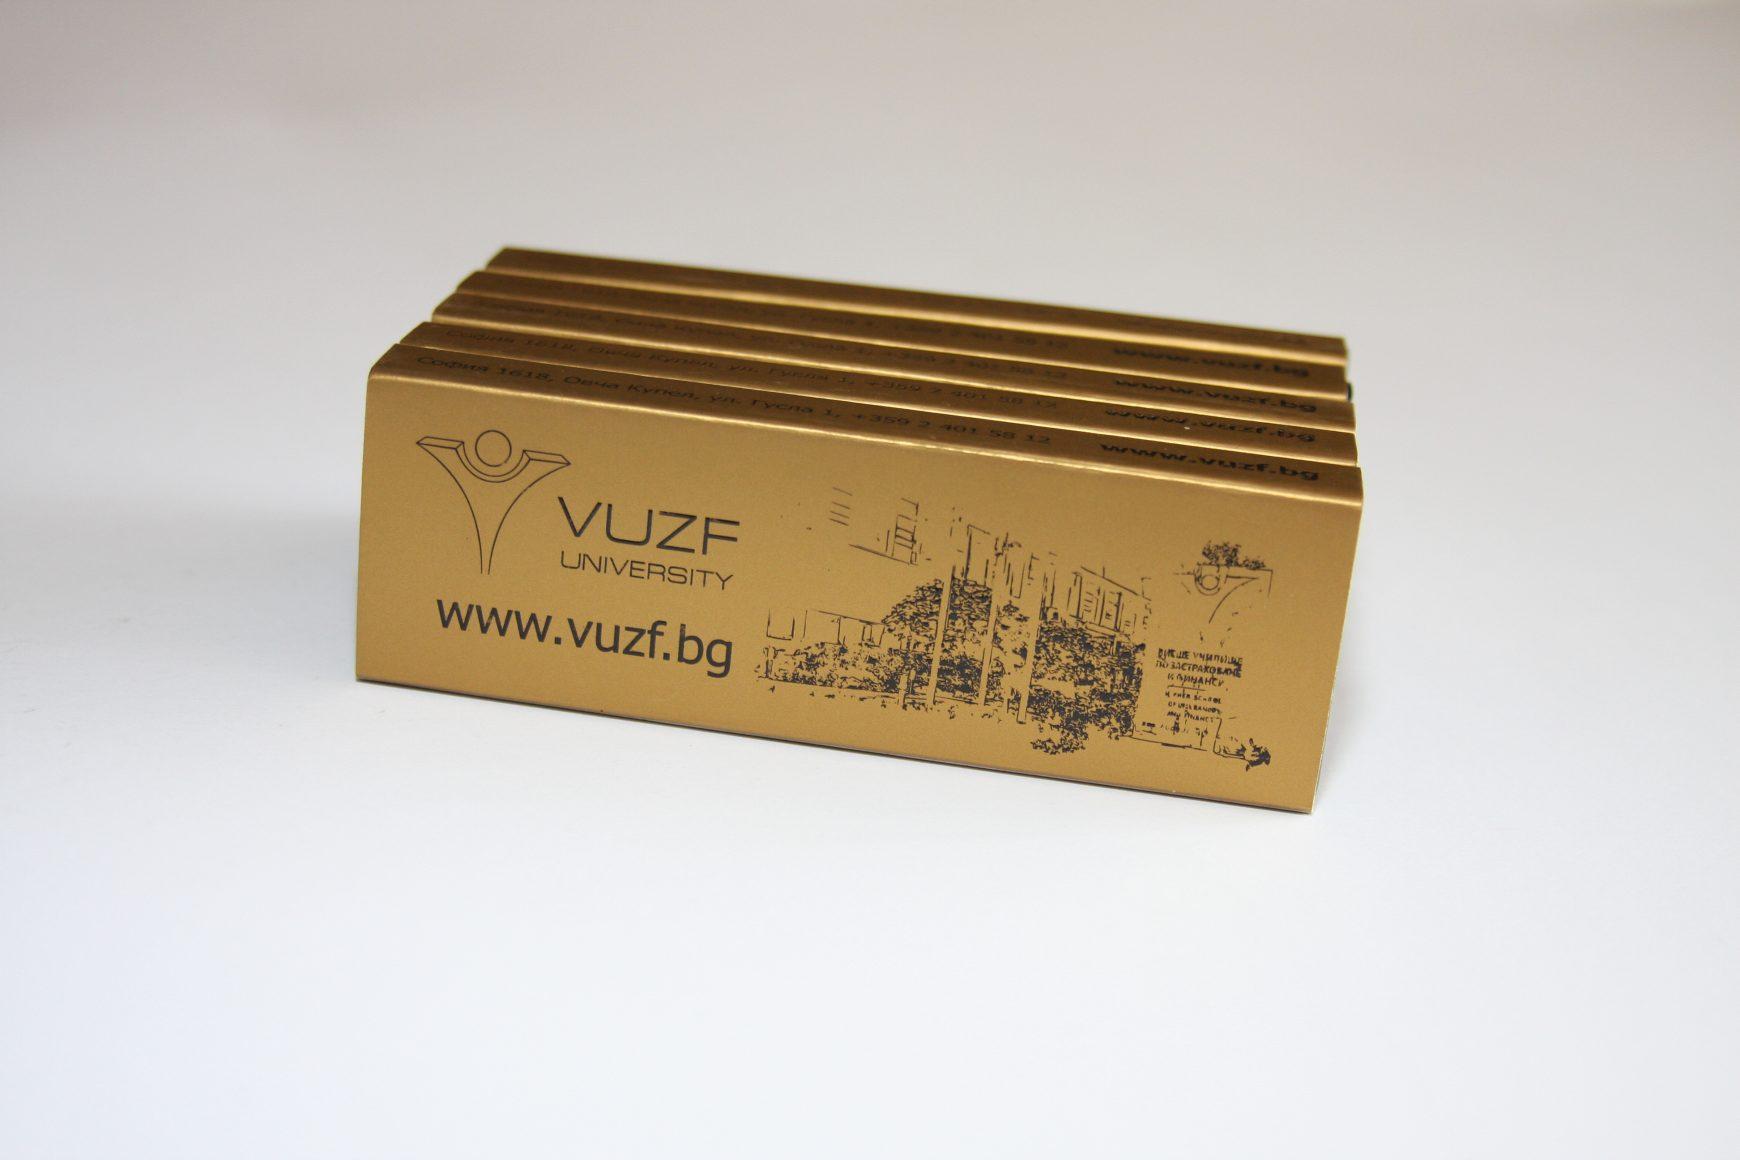 Matches for VUZF